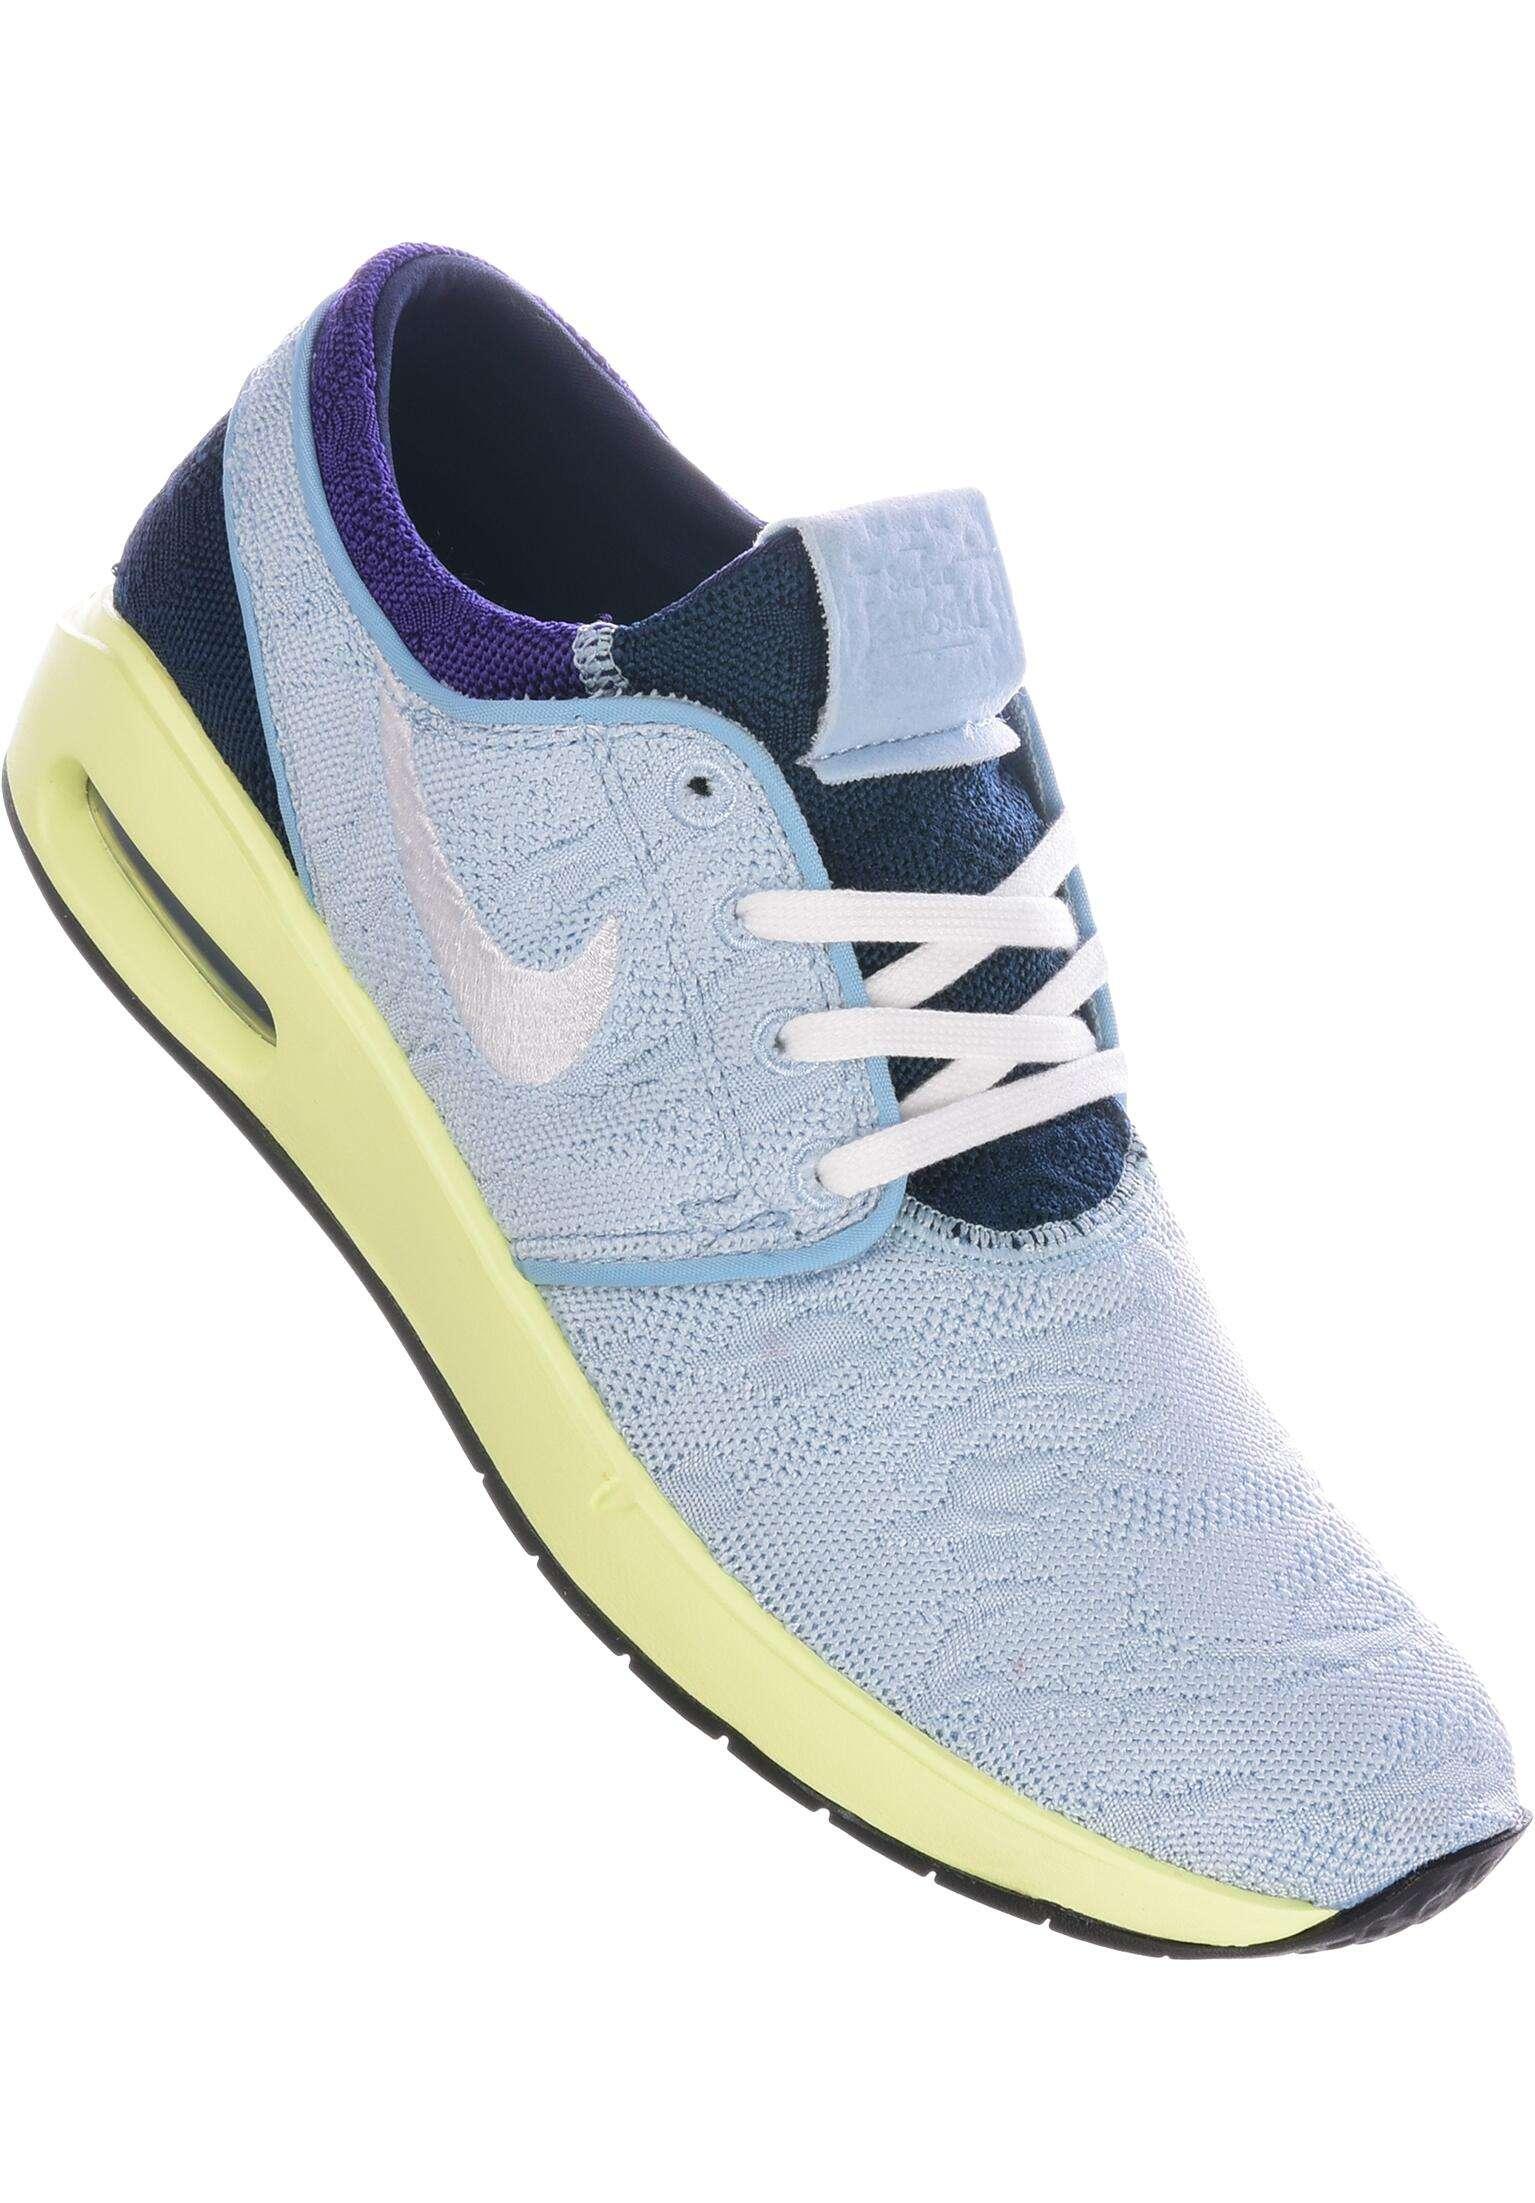 8336697149 Air Max Janoski 2 Nike SB All Shoes in lightamoryblue-white for Men   Titus